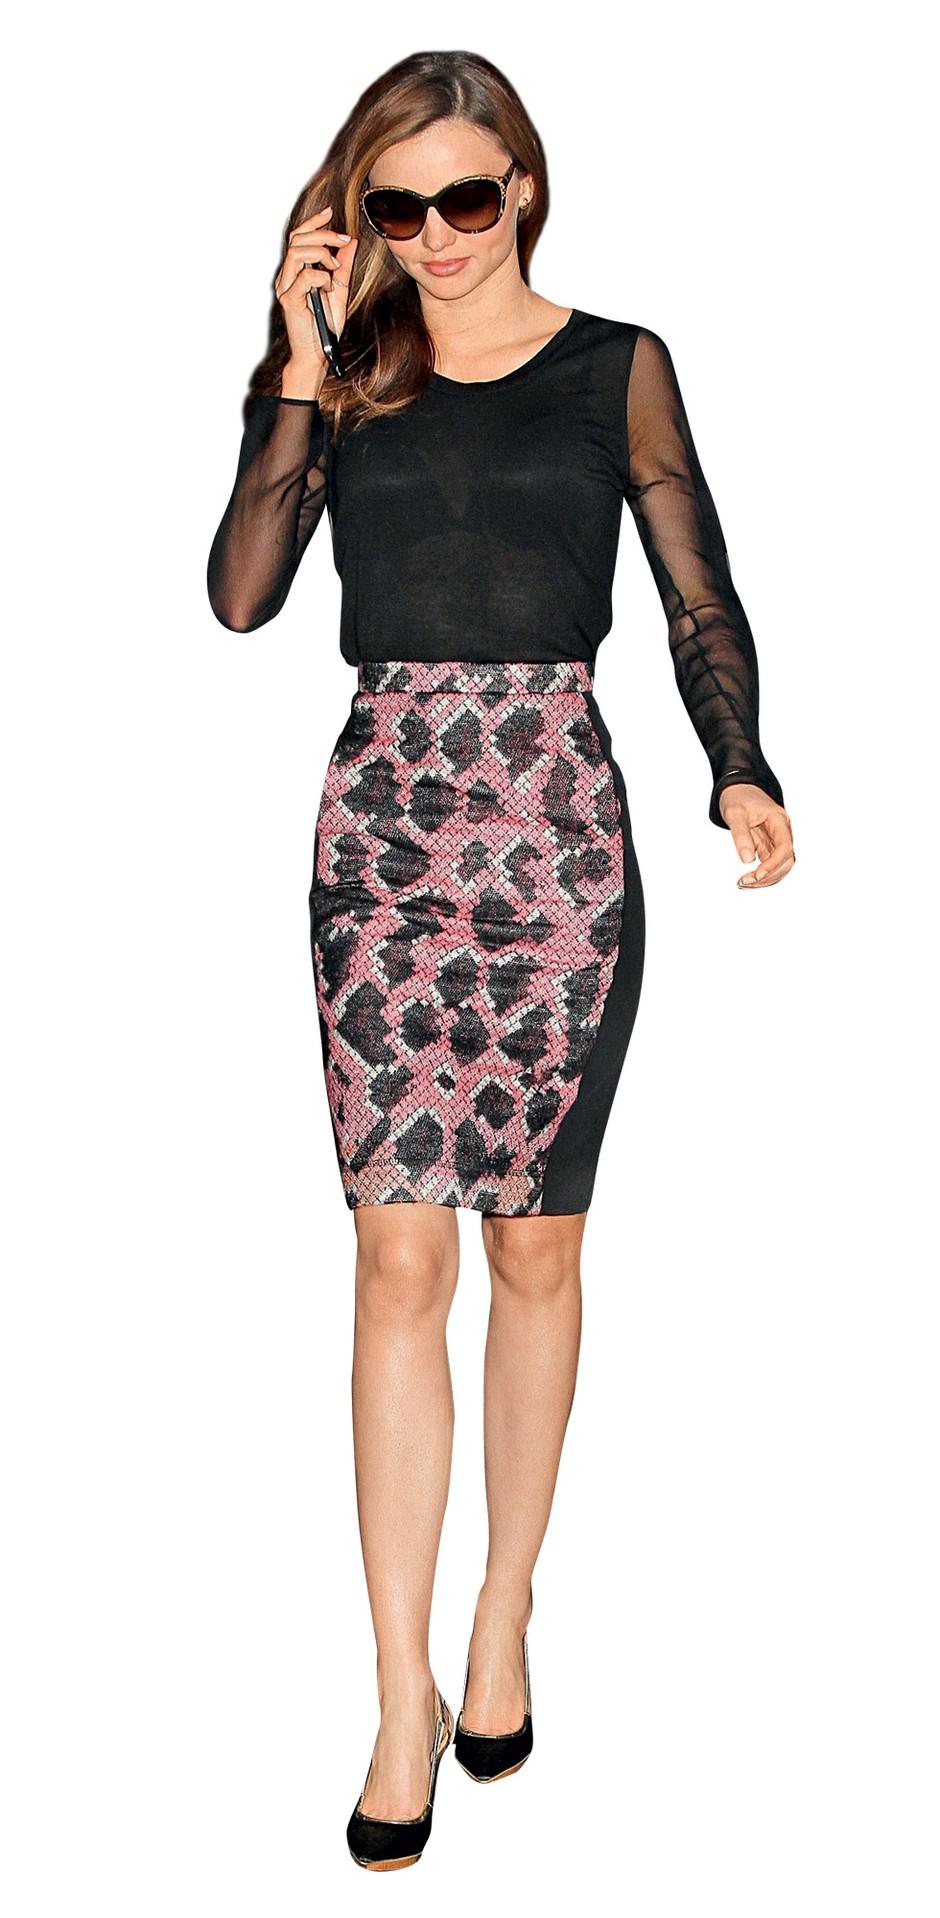 Miranda Kerr (foto: Alex Štokelj, Profimedia, promocijsko gradivo)